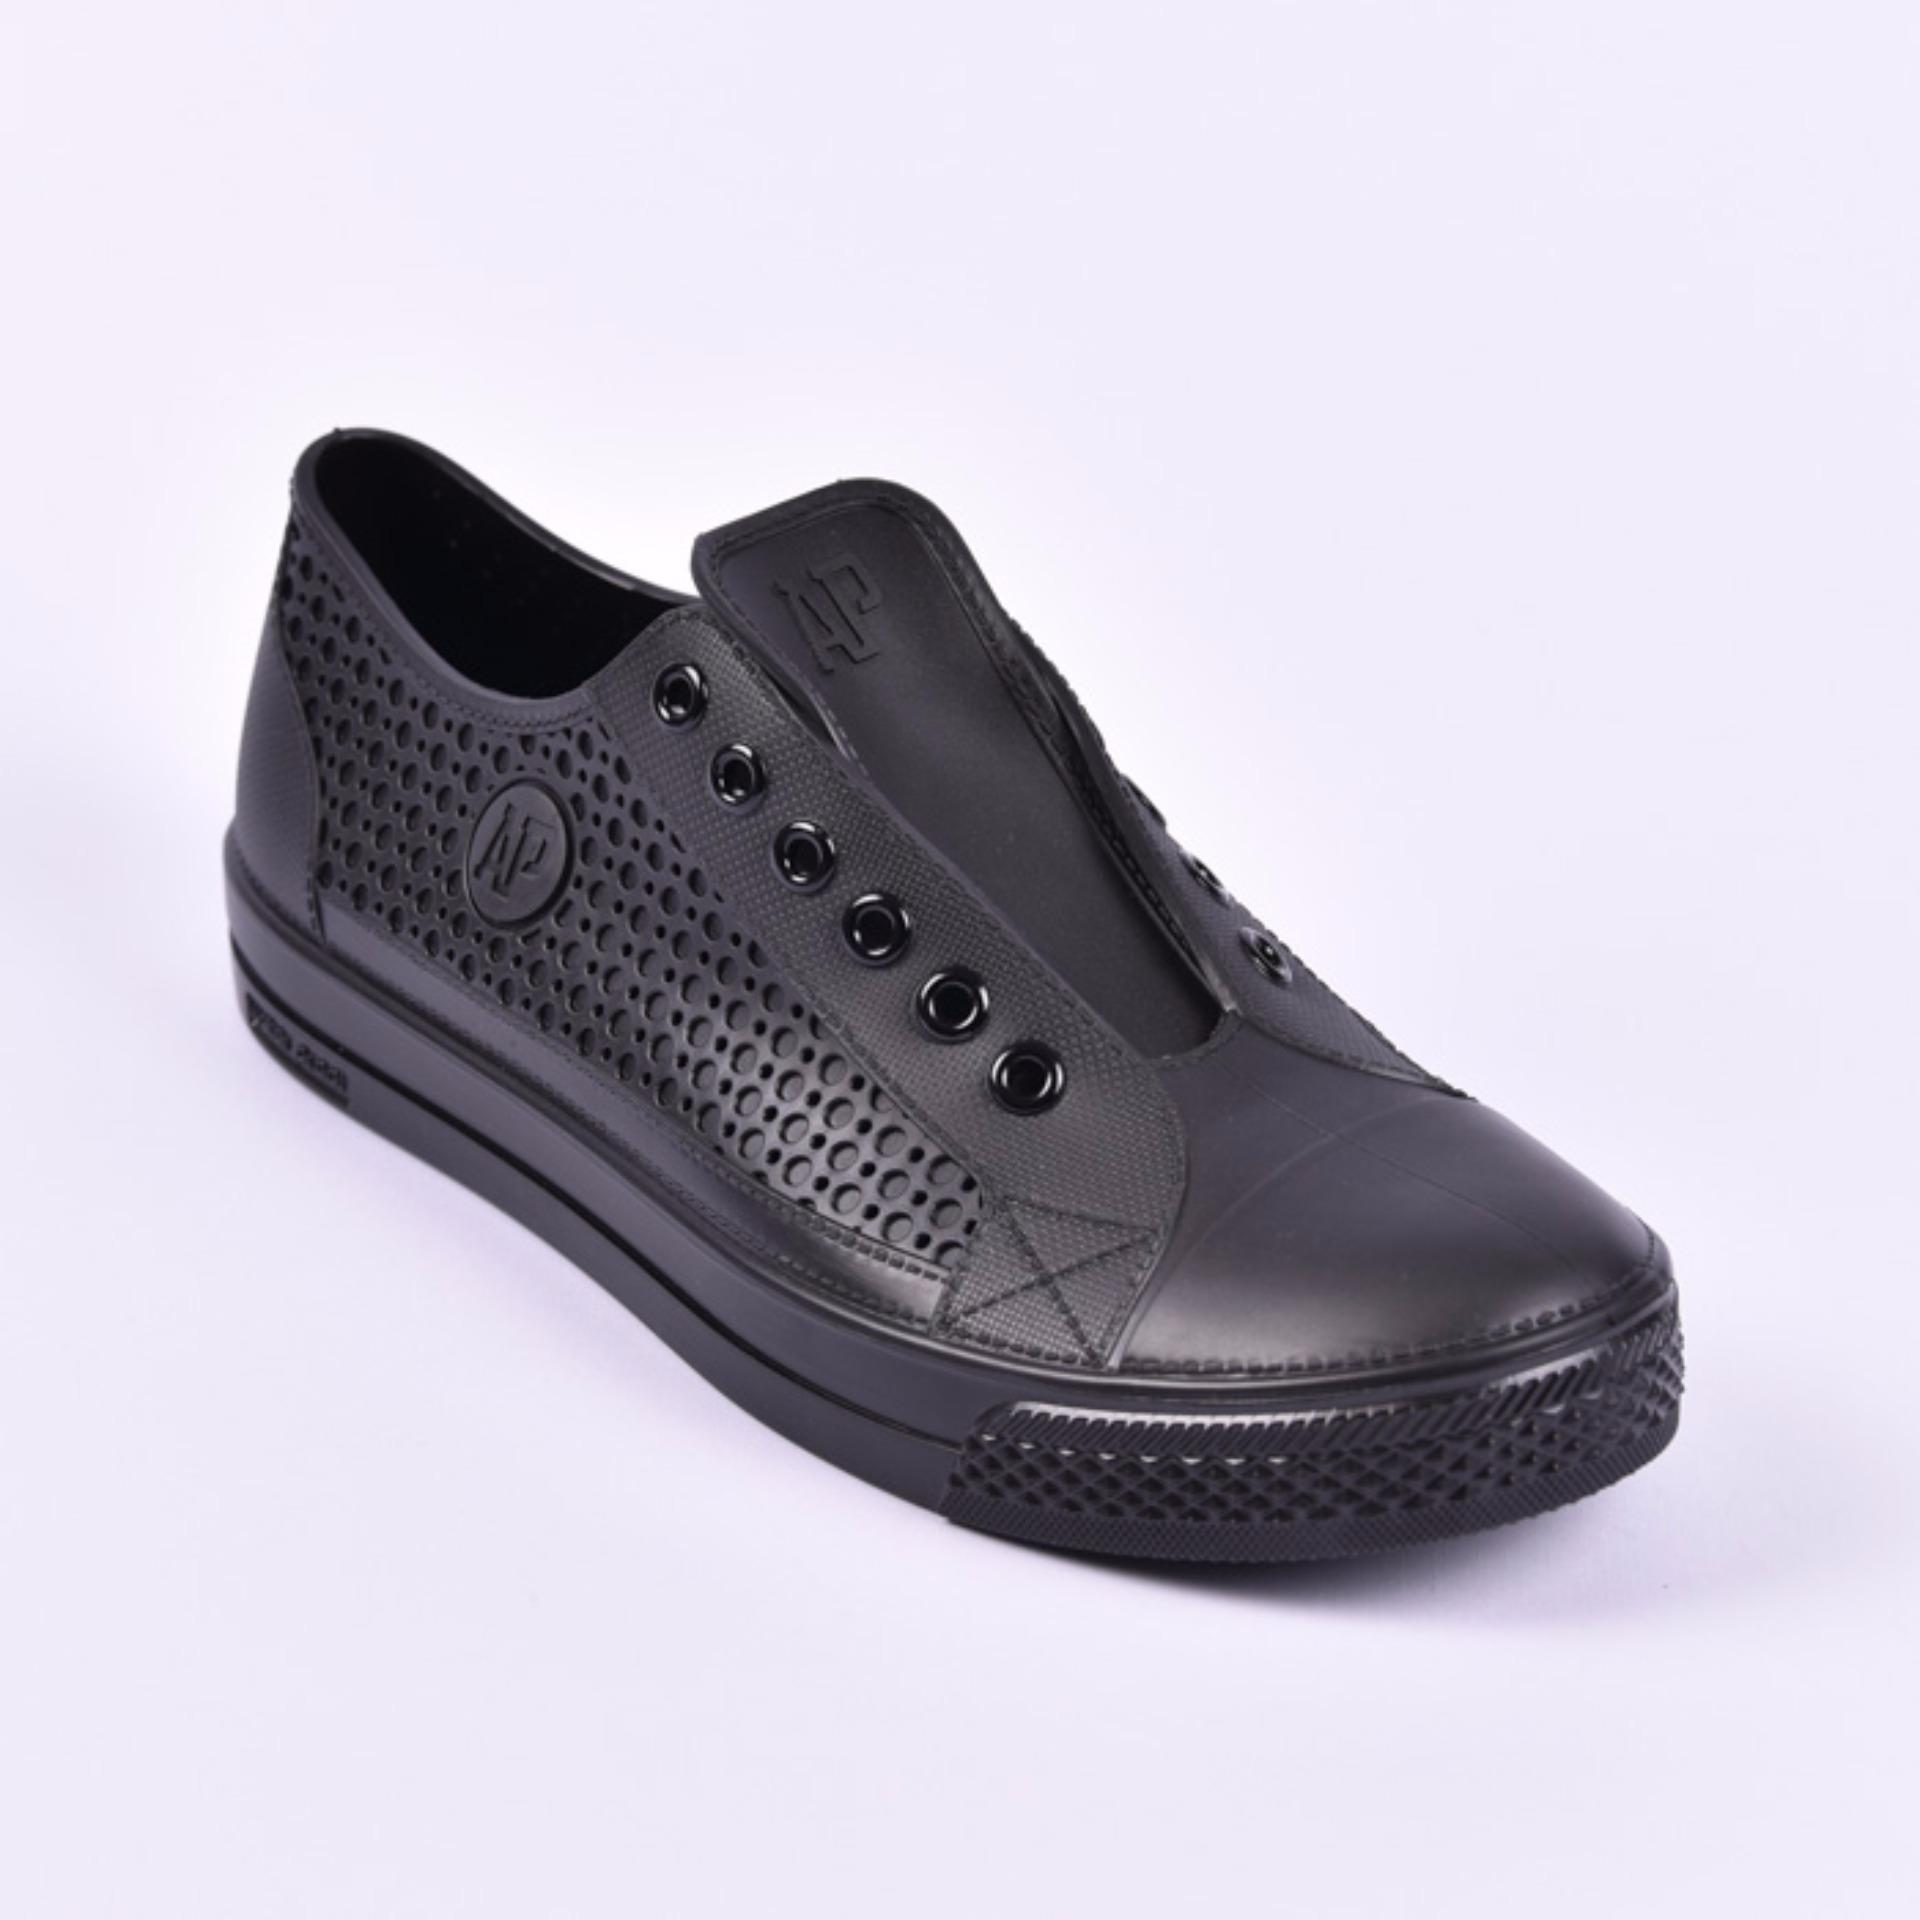 Sepatu ApStar AP Star By Ap Boots Karet PVC Casual Sepatu Sneakers kets . e56f04f3d3